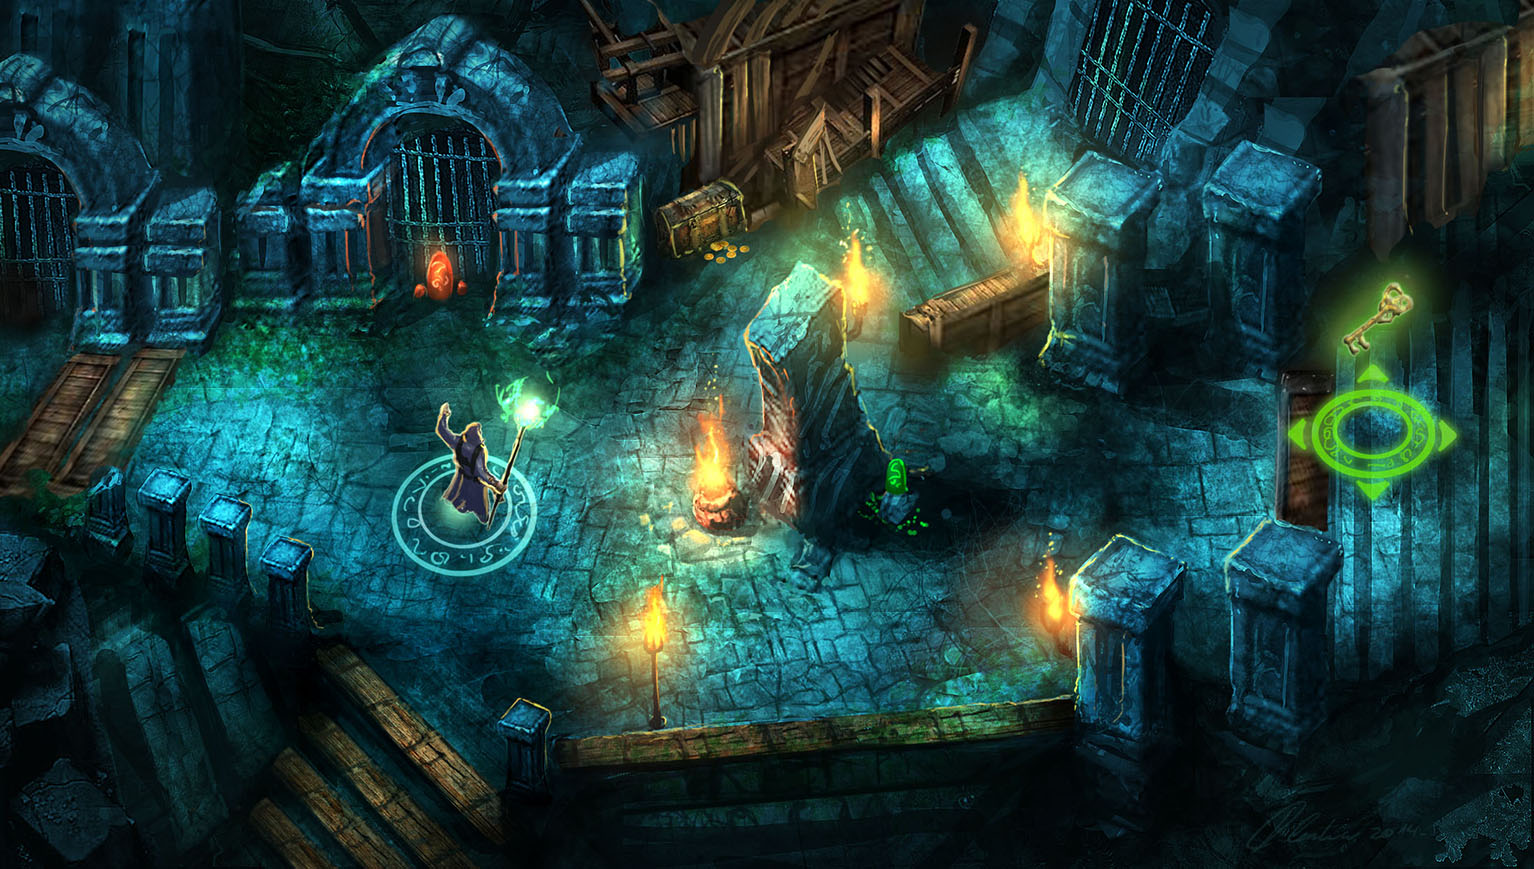 Dungeon2_concept_final2_s.jpg